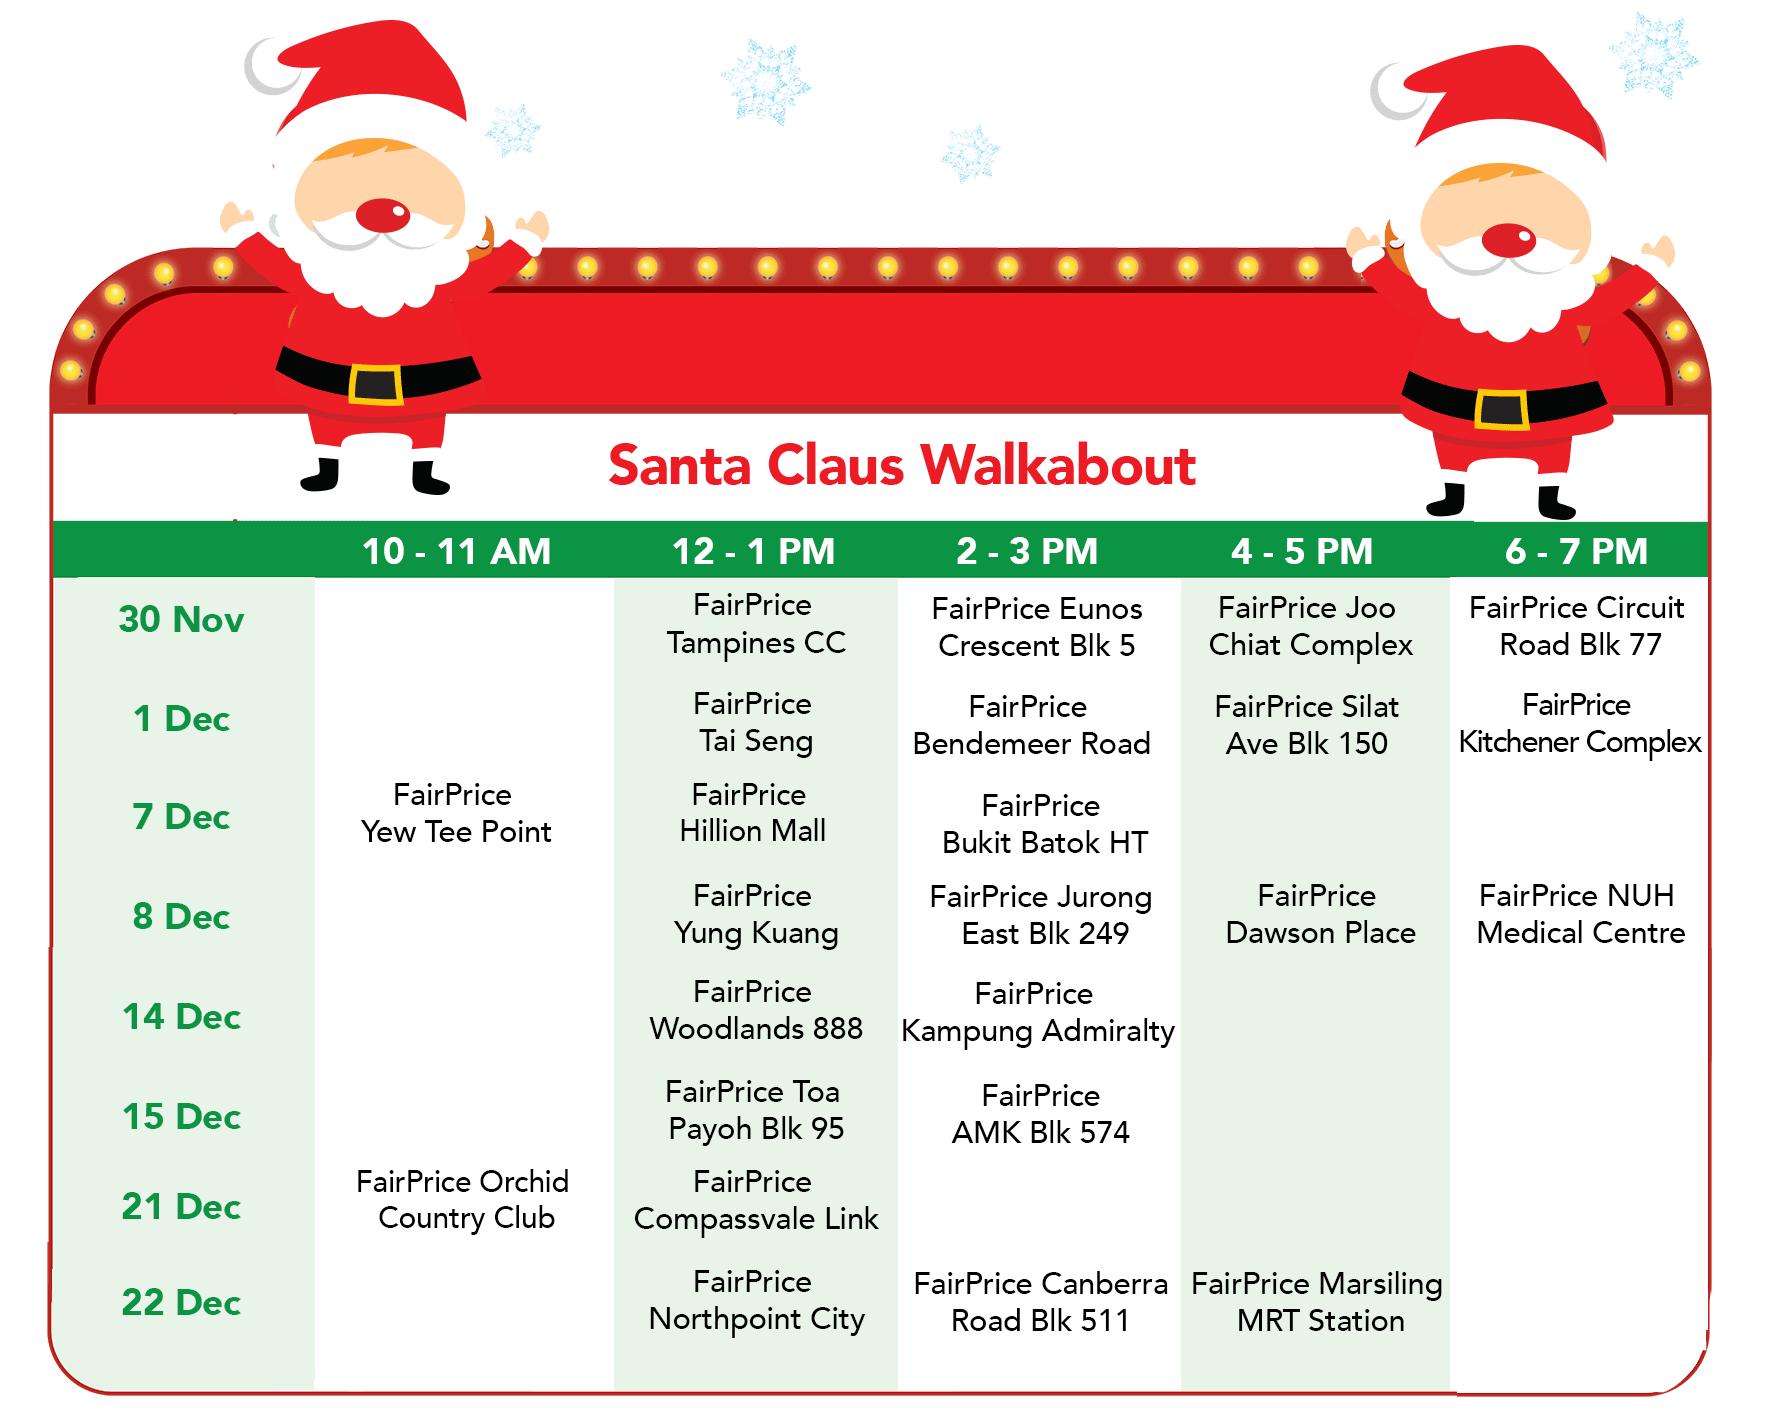 FairPrice Christmas - Santa Claus Walkabout